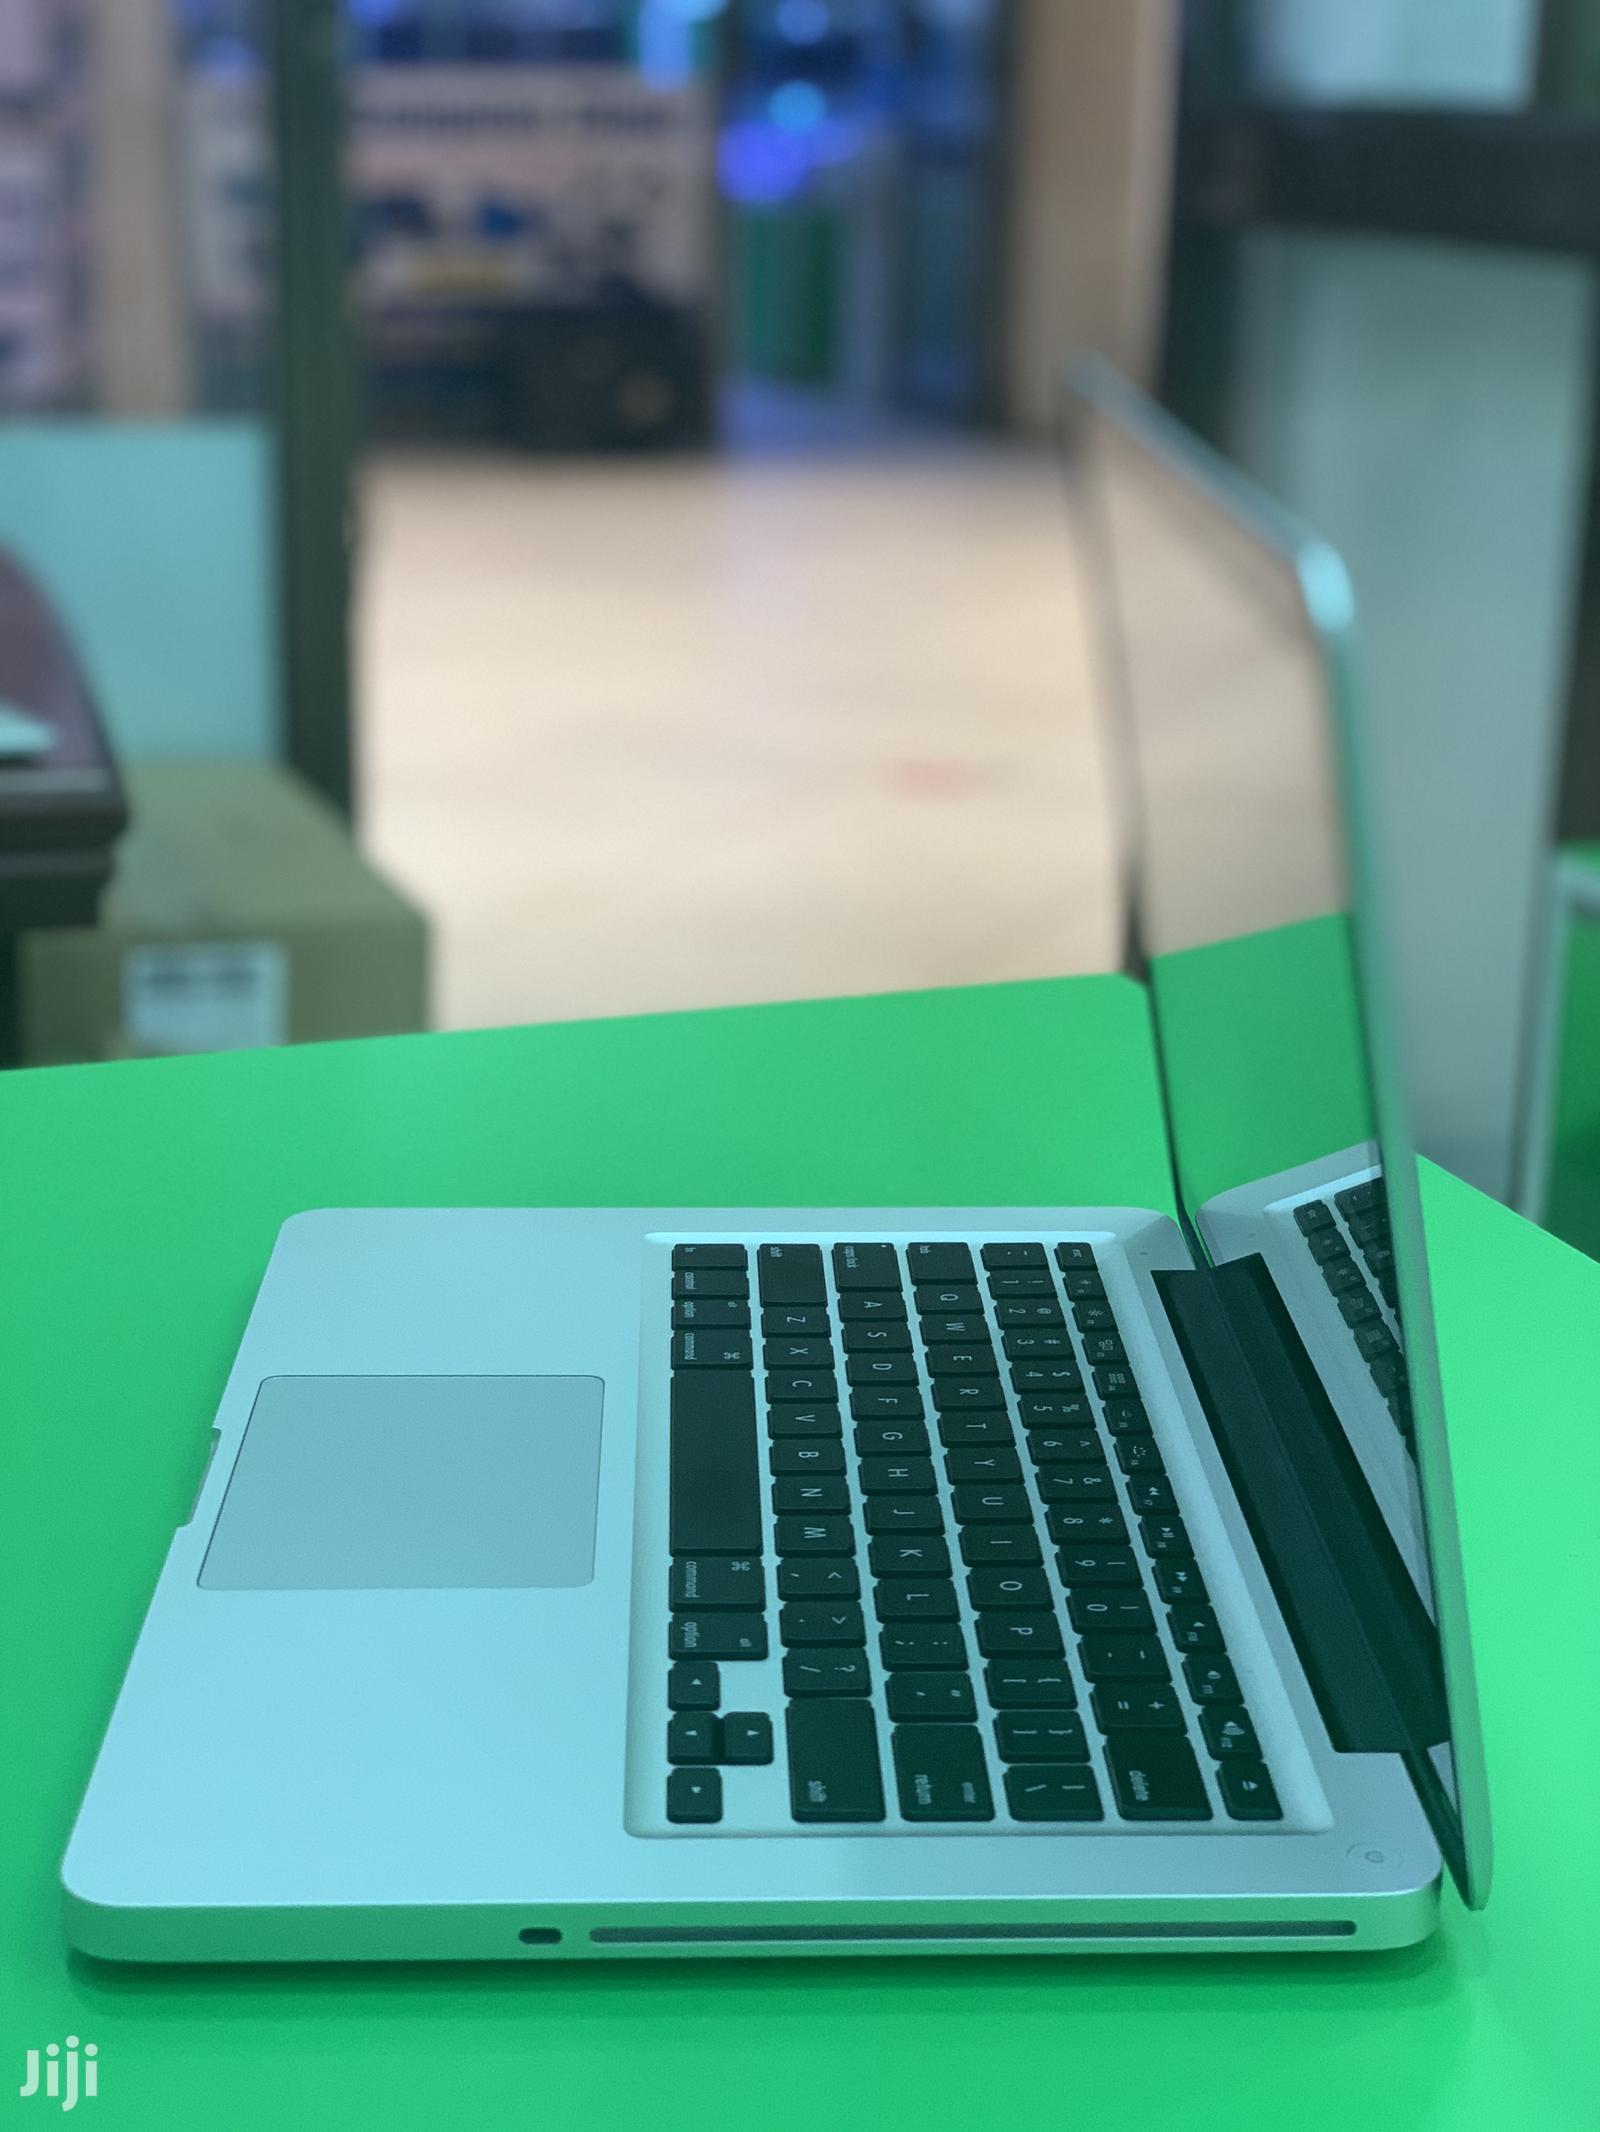 Laptop Apple MacBook Pro 8GB Intel Core I5 HDD 500GB | Laptops & Computers for sale in Kampala, Central Region, Uganda